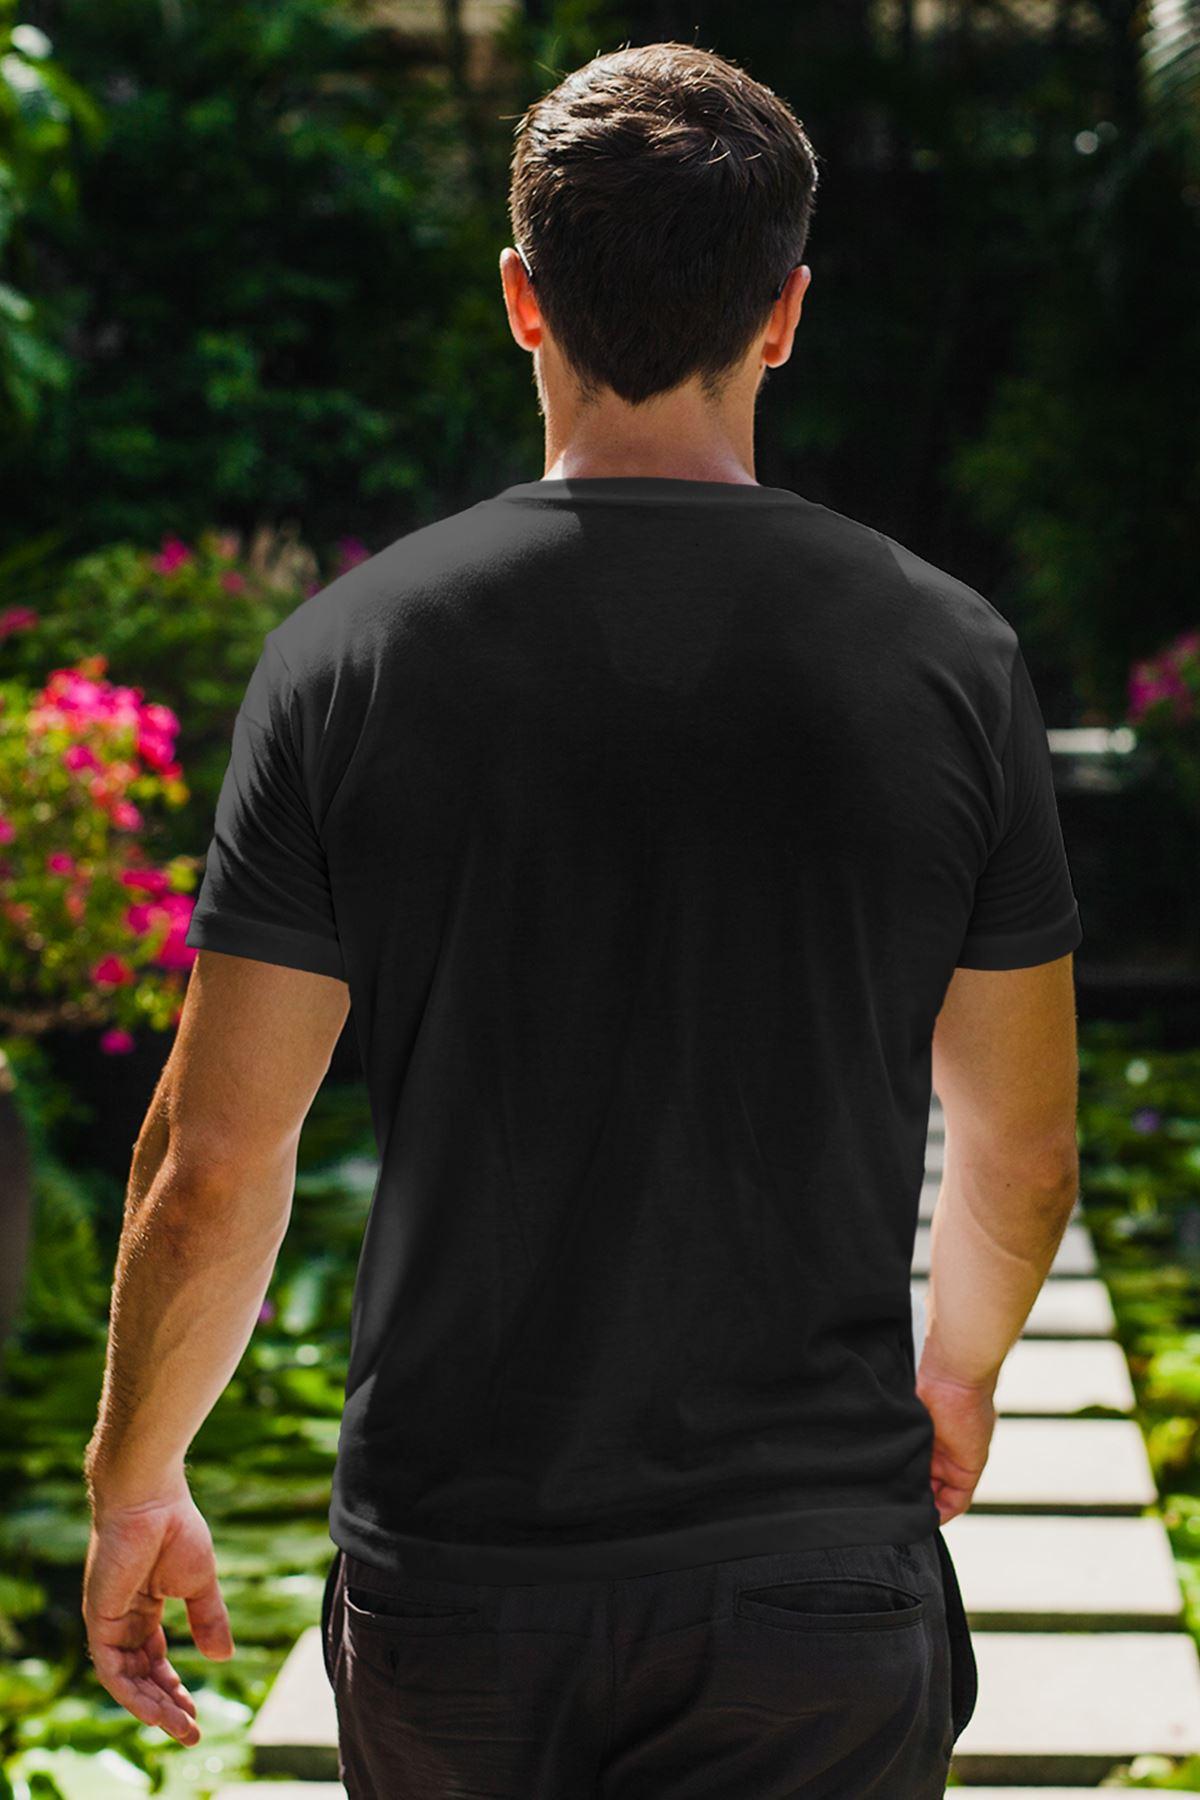 LA Siyah Erkek Tshirt - Tişört